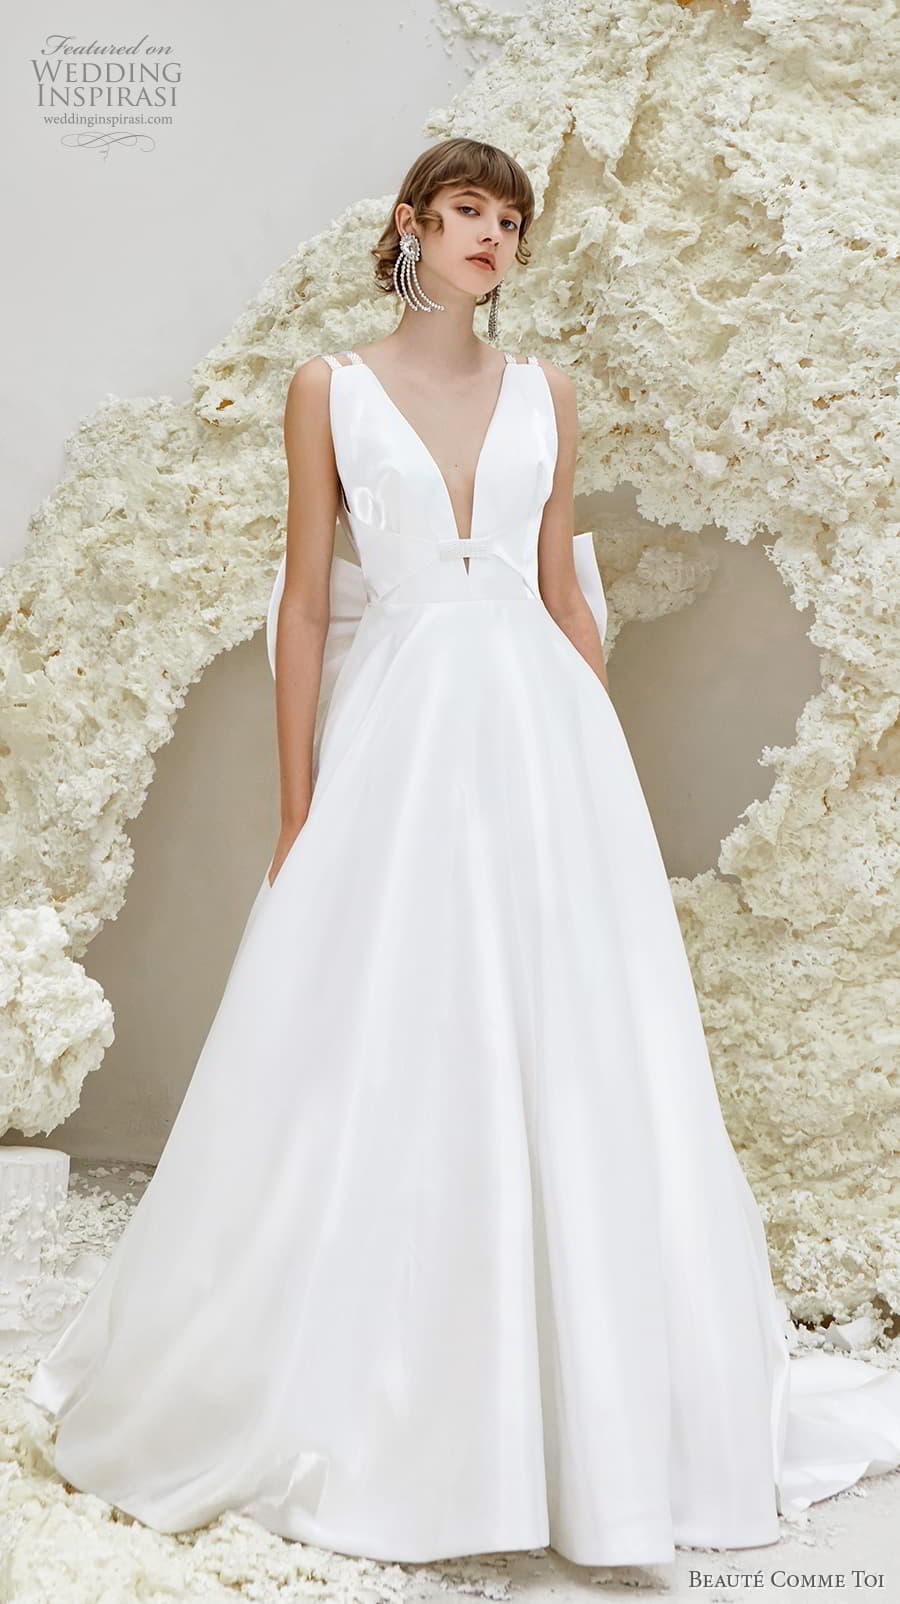 beaute comme toi spring 2022 bridal double strap deep v neckline simple minimalist modern chic a line wedding dress low ribbon back chapel train (phyllis) mv